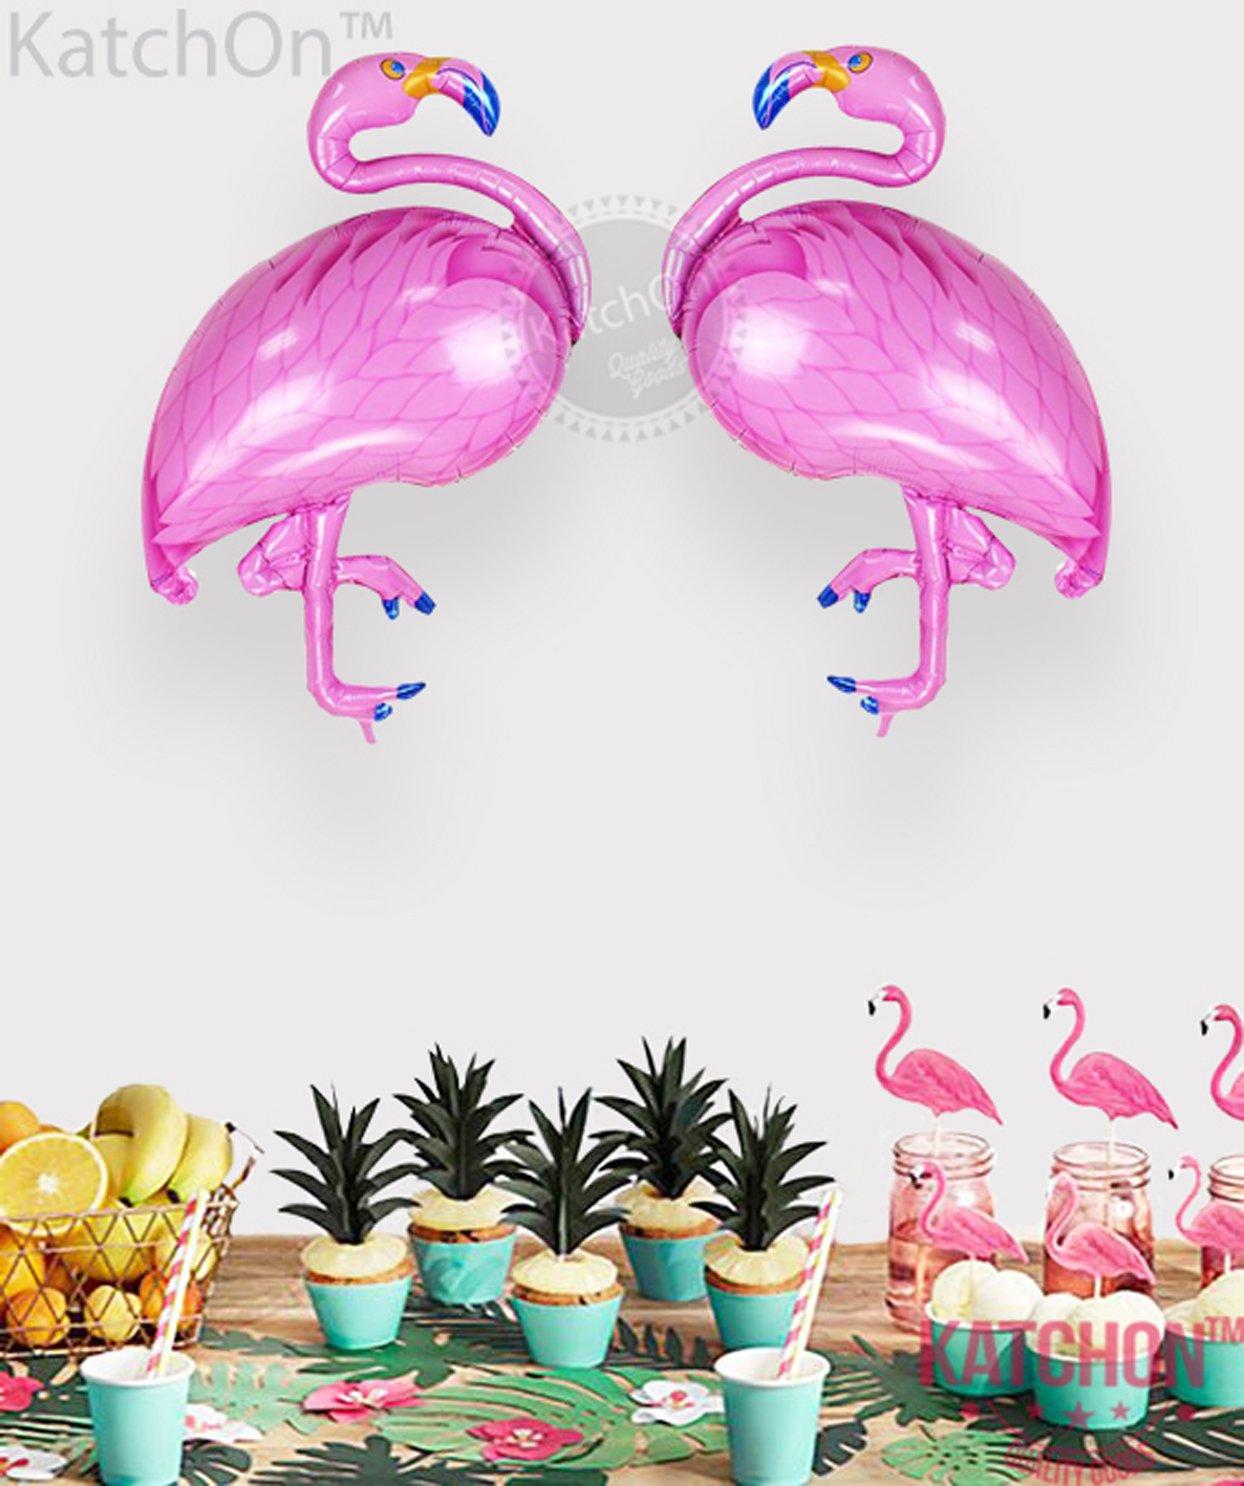 Amazon.com: KATCHON 2 Giant Flamingo Helium Balloon - Pack of 2 ...